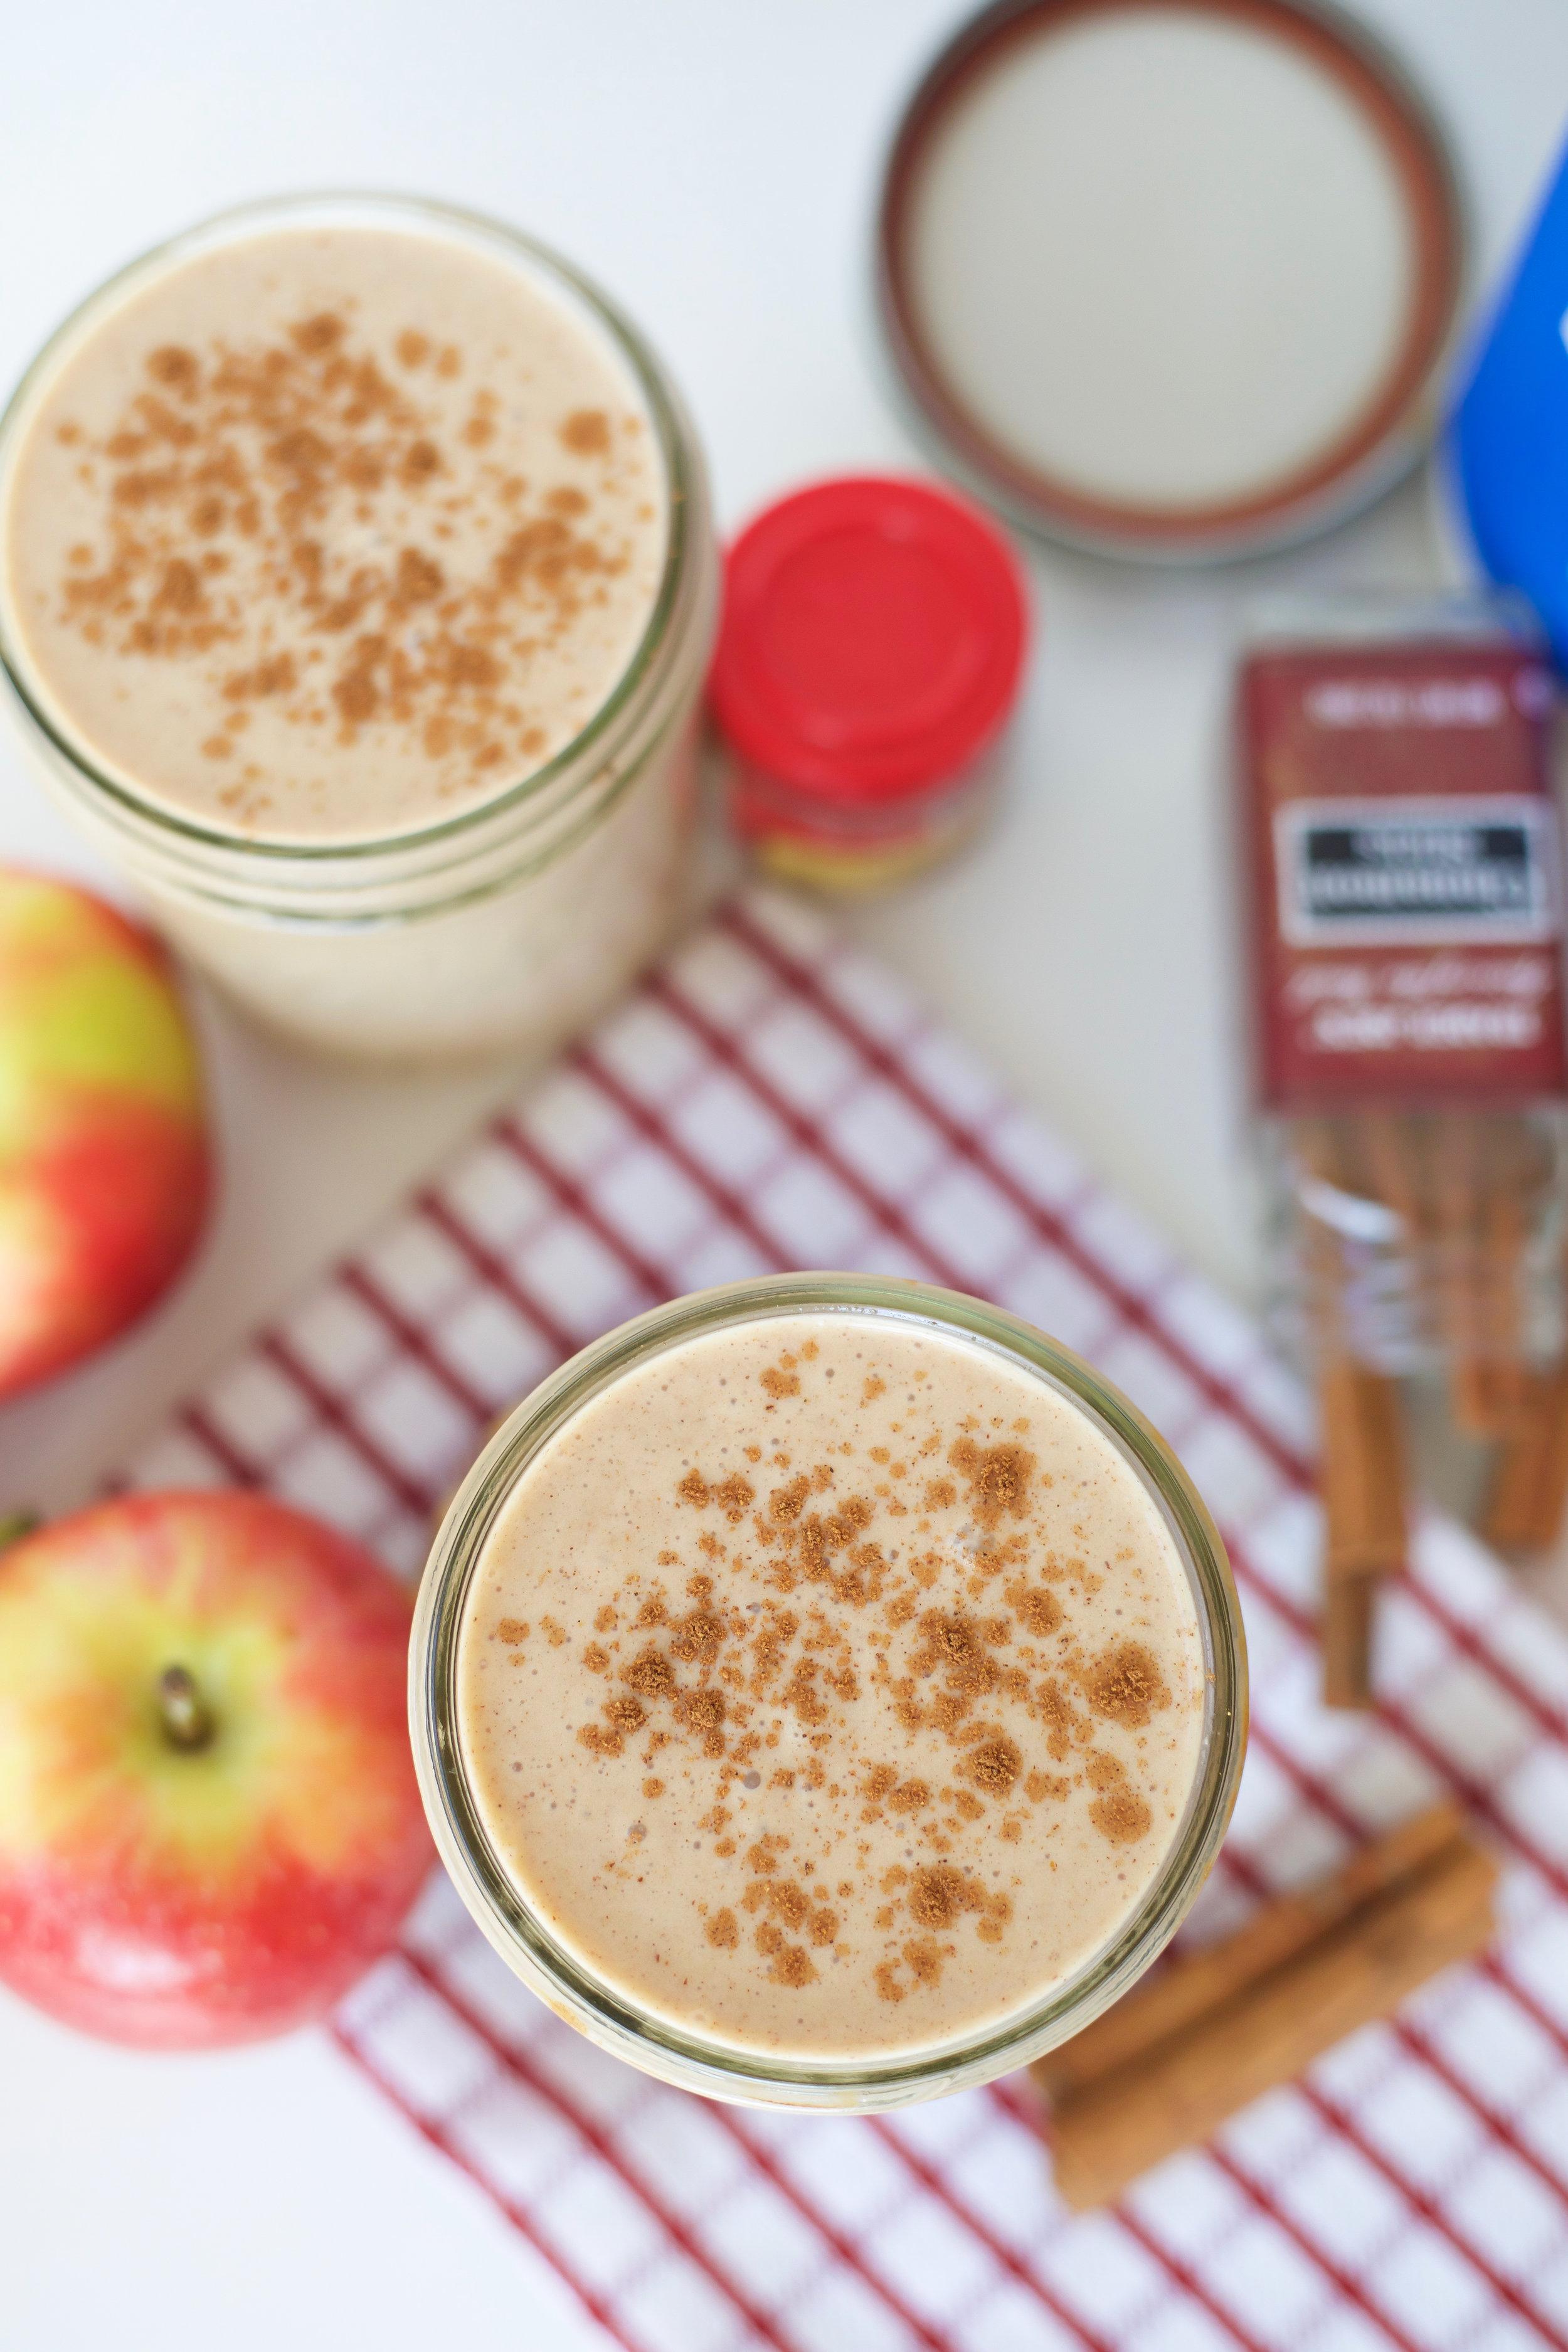 apple pie smoothie, apple pie, paleo, grain free, gluten free, dairy free, primal, real food, smoothies, healthy smoothies